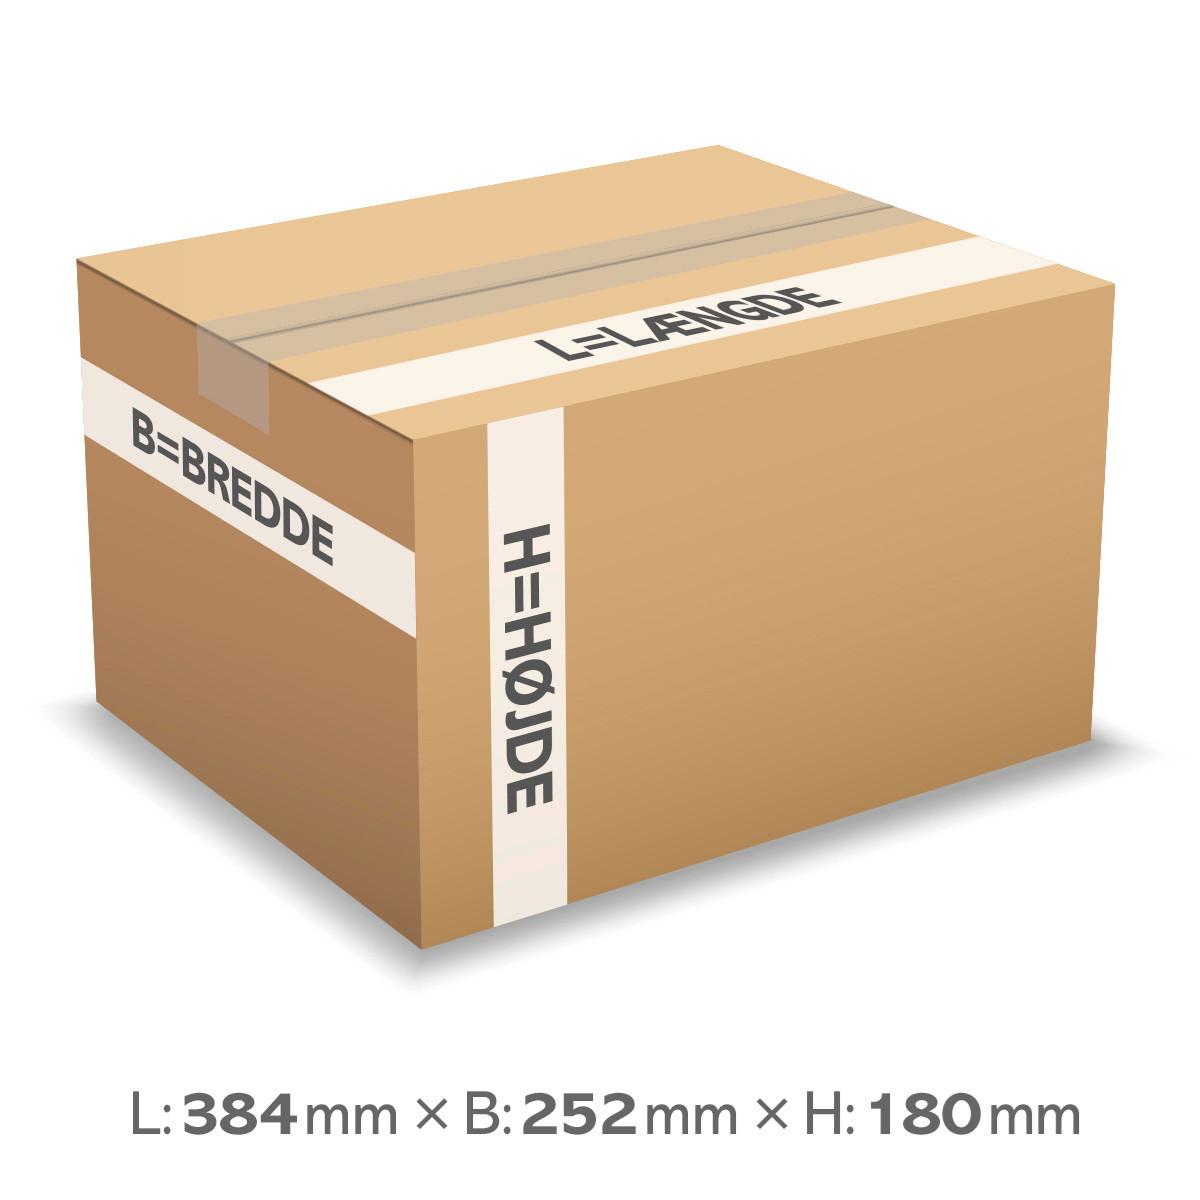 Bølgepapkasse Master'In 384x252x180mm 312 - 17L - 3mm